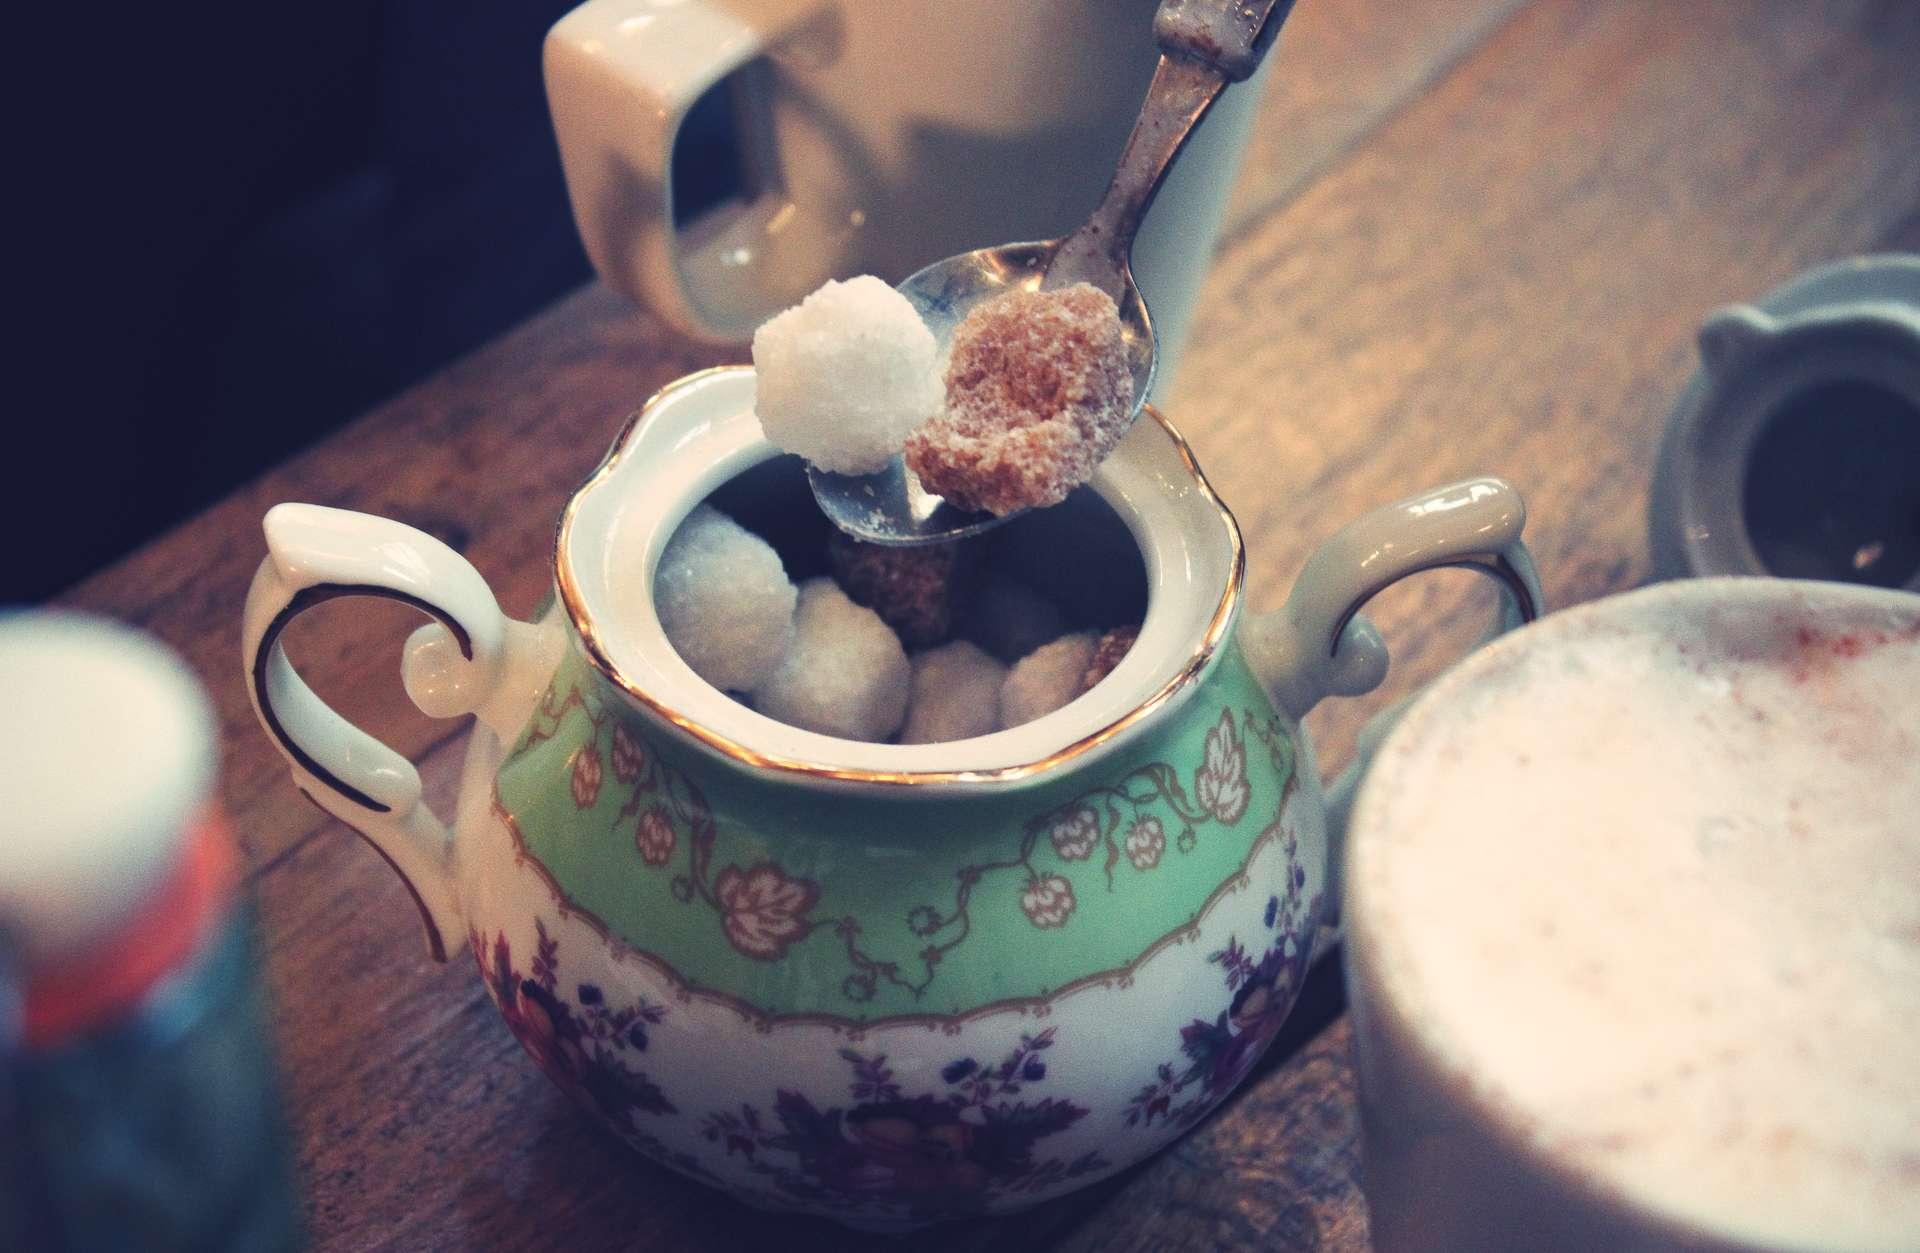 cardiff-erope-trip-breakfast-bblogger-lifestyle-nunaavane-ctbb3